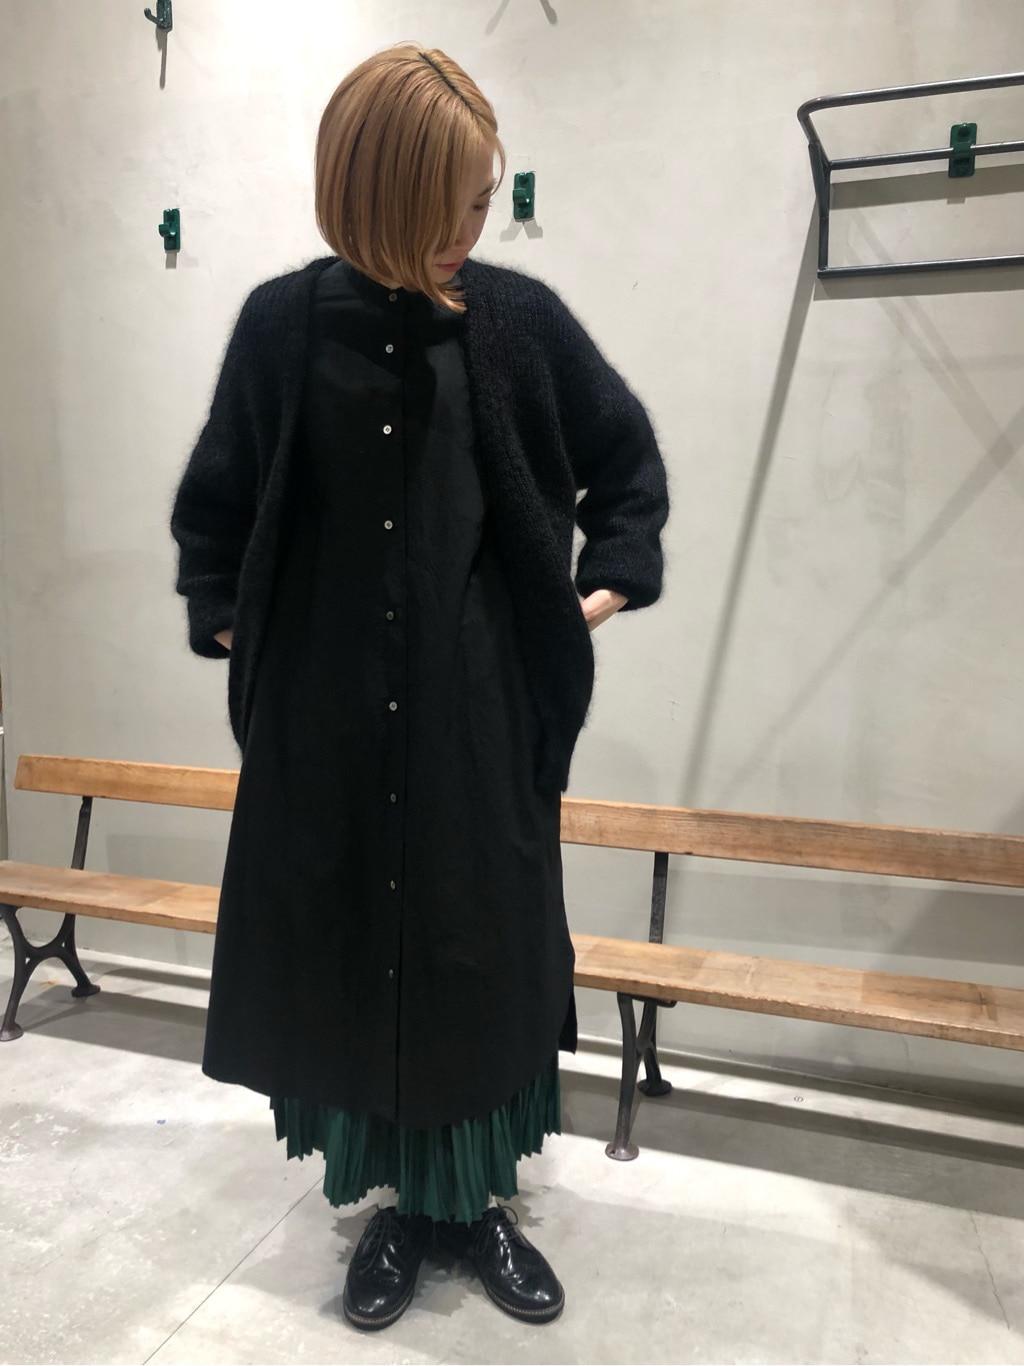 yuni 東急プラザ銀座 身長:154cm 2020.12.18